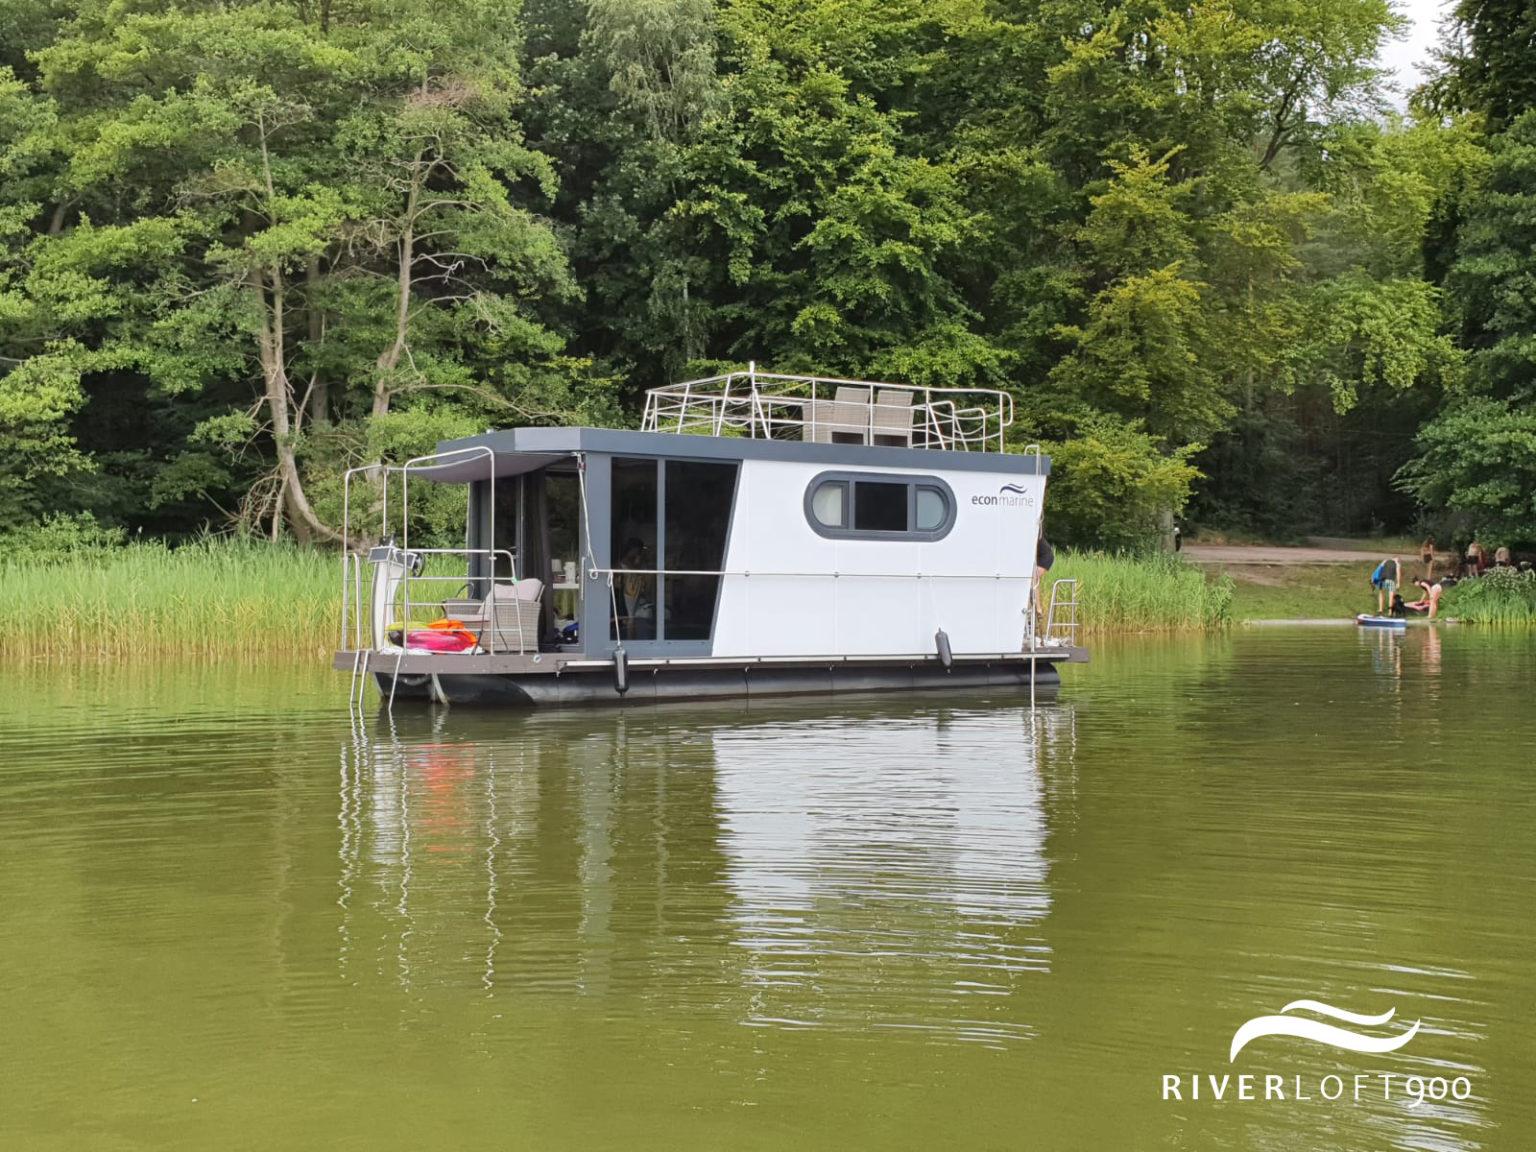 RiverLoft-900-1-1 (1)